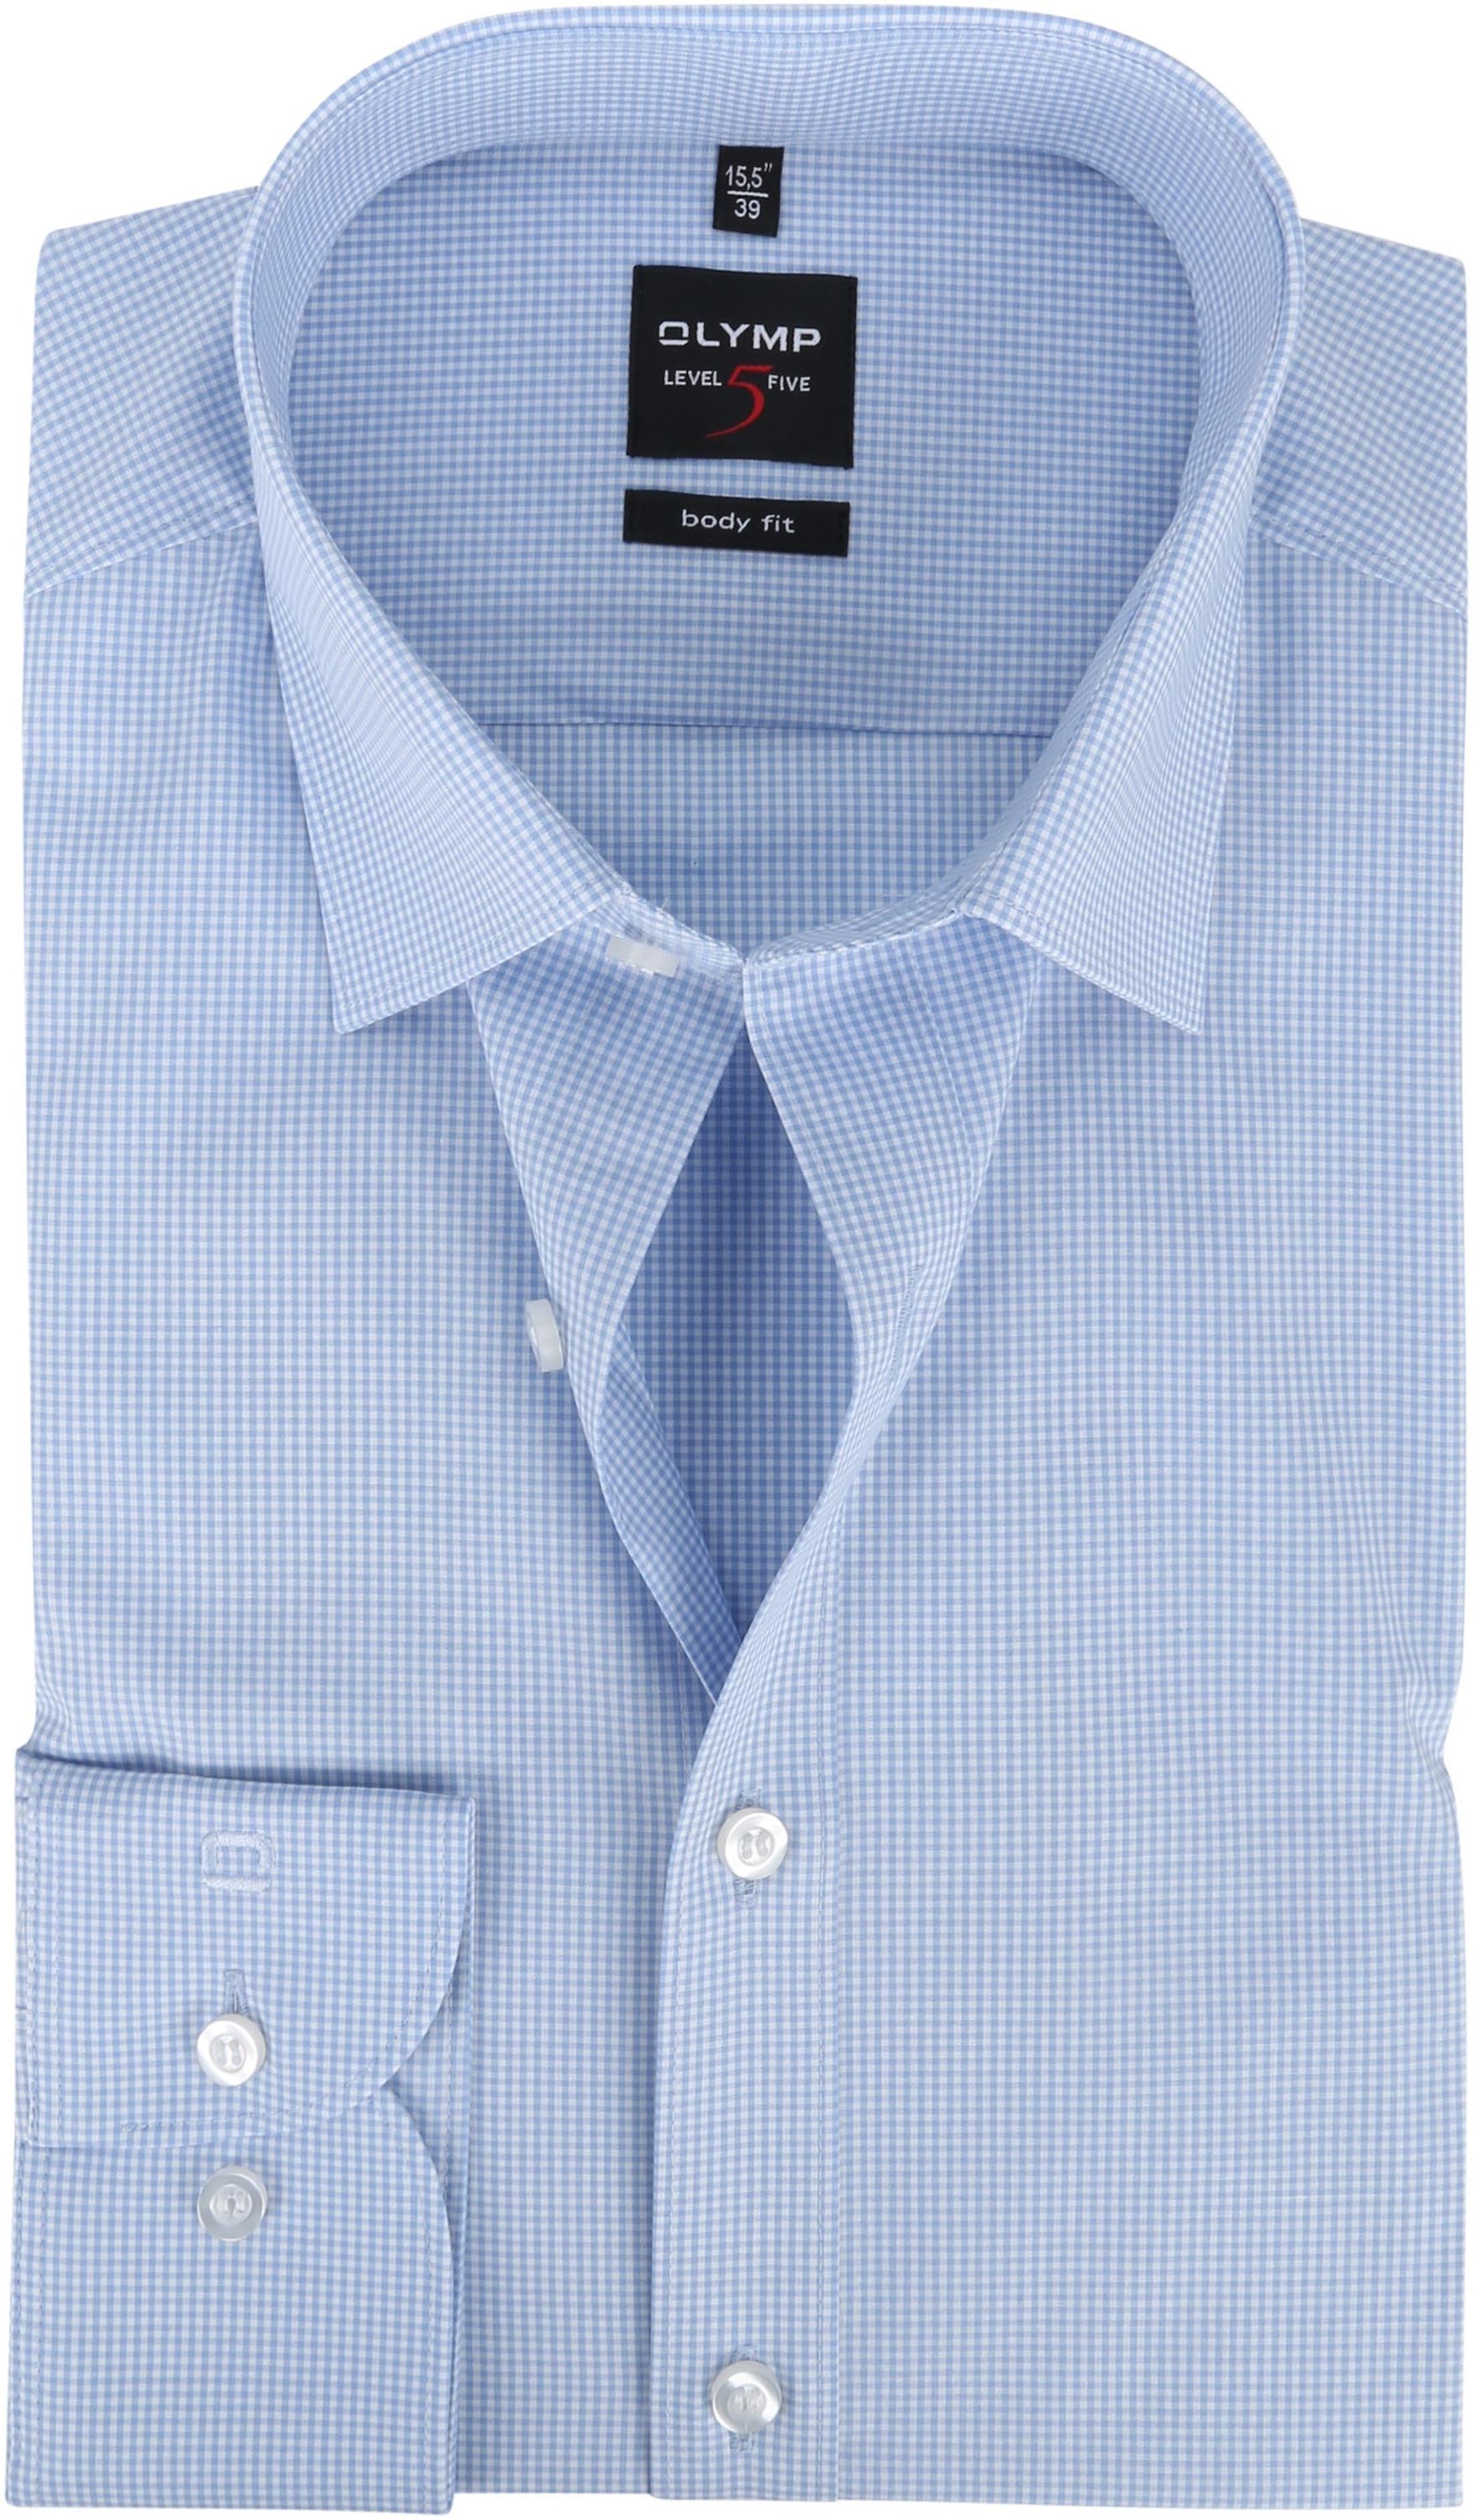 OLYMP Overhemd Level 5 Ruit Blauw